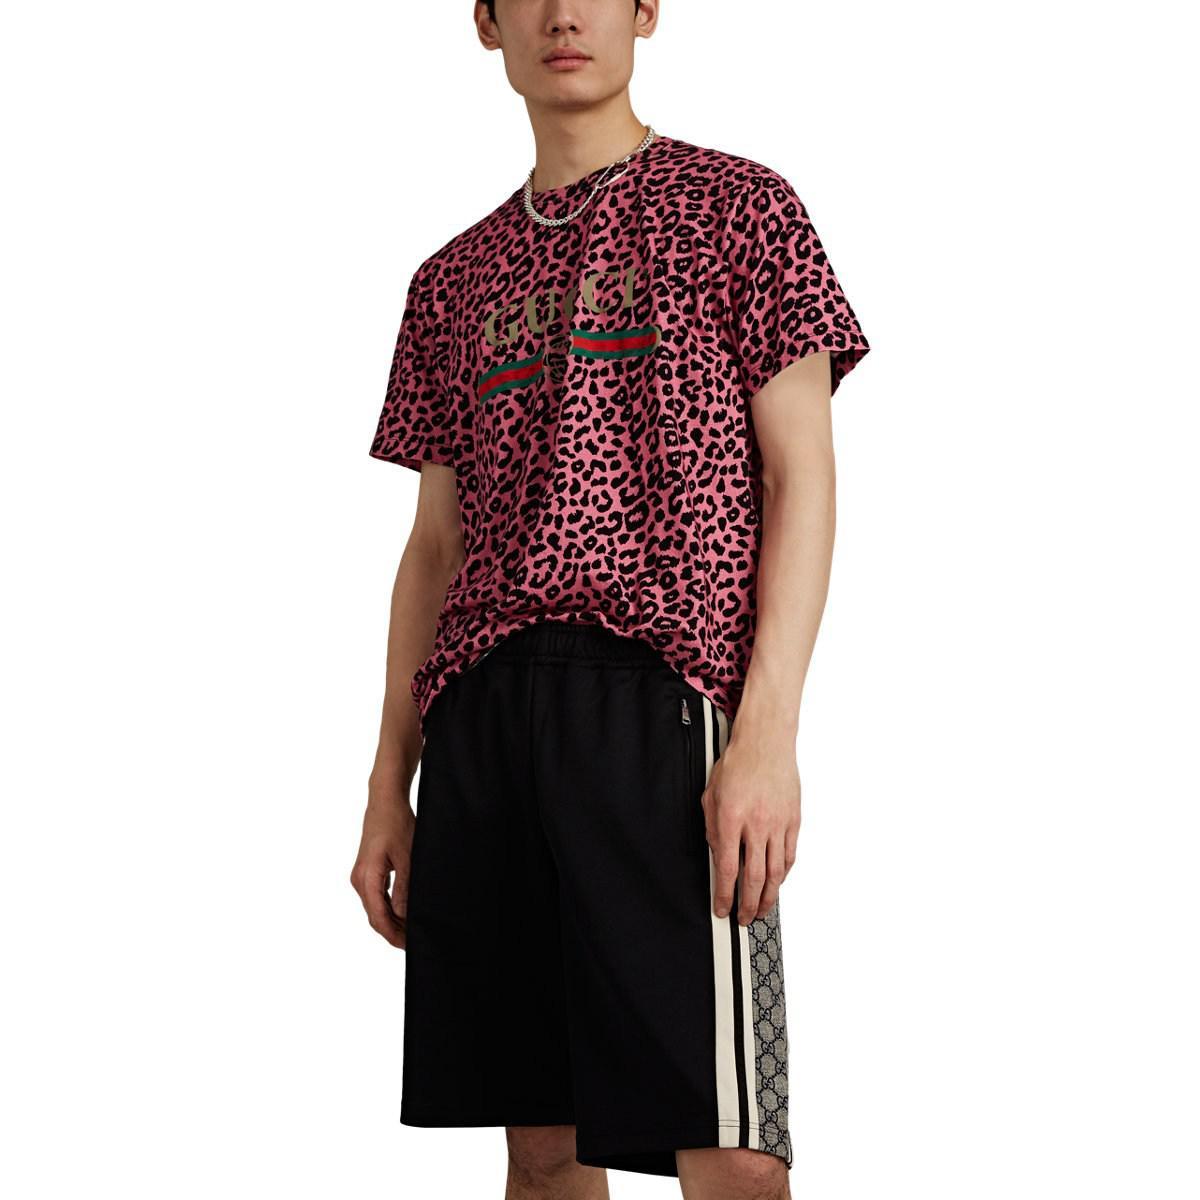 8b6ae3787a00 Lyst - Gucci Vintage-logo Leopard-print Cotton T-shirt in Black for Men